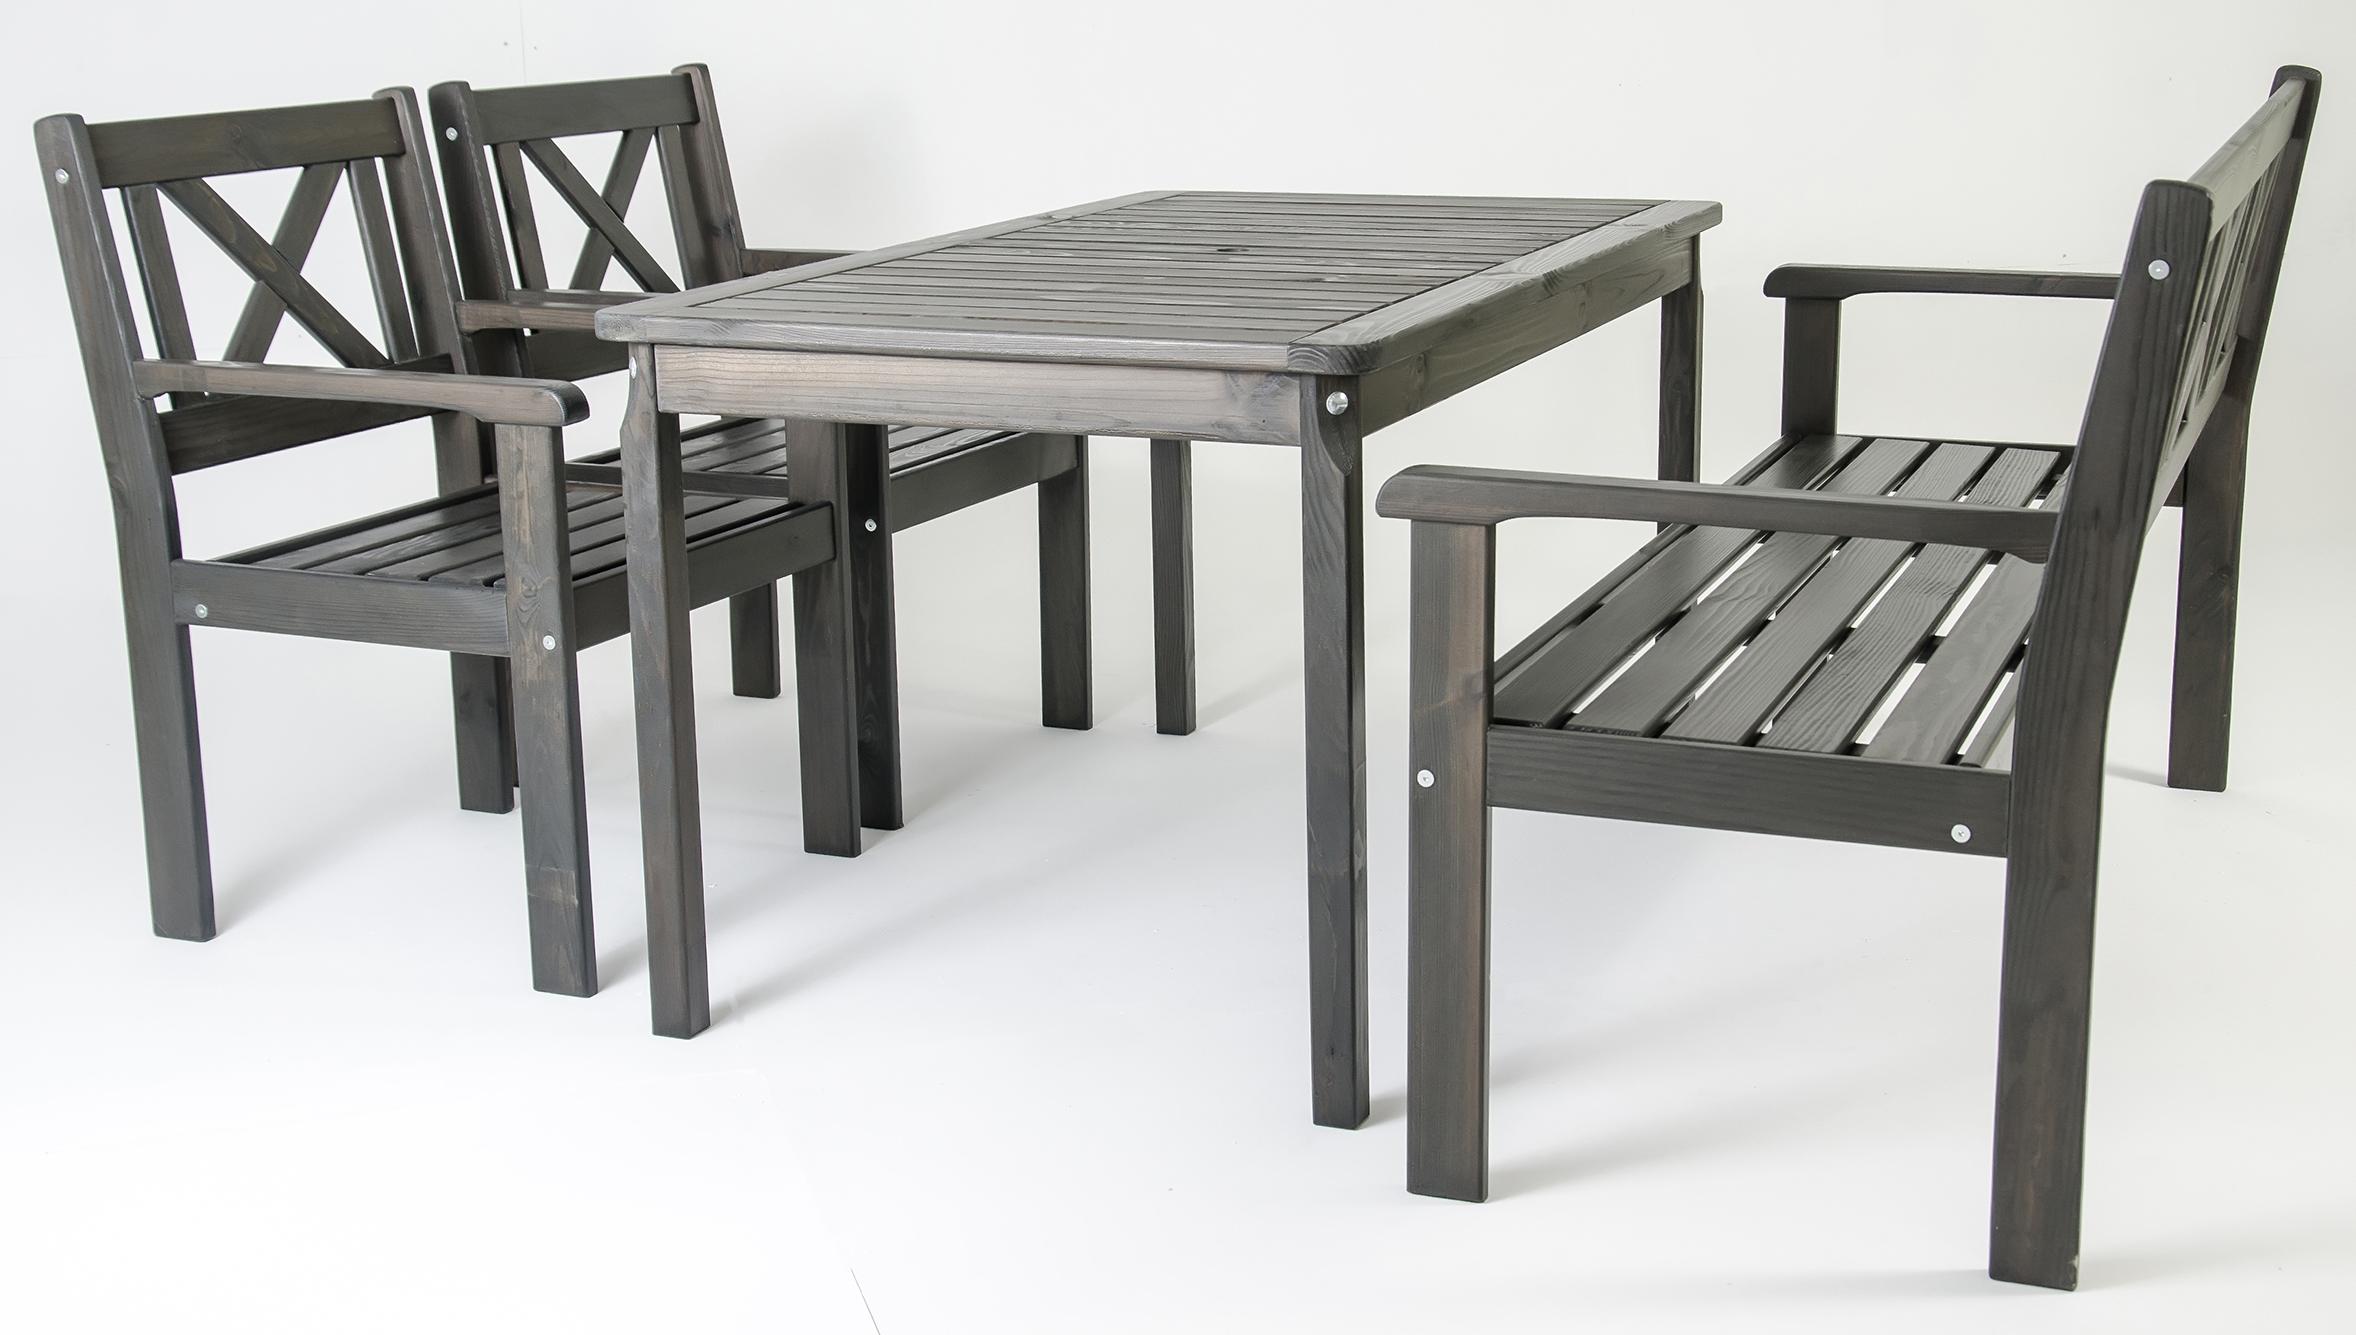 4tlg gartenset gartenm bel essgruppe landhaus sessel bank tisch 135 x 77 cm ebay. Black Bedroom Furniture Sets. Home Design Ideas